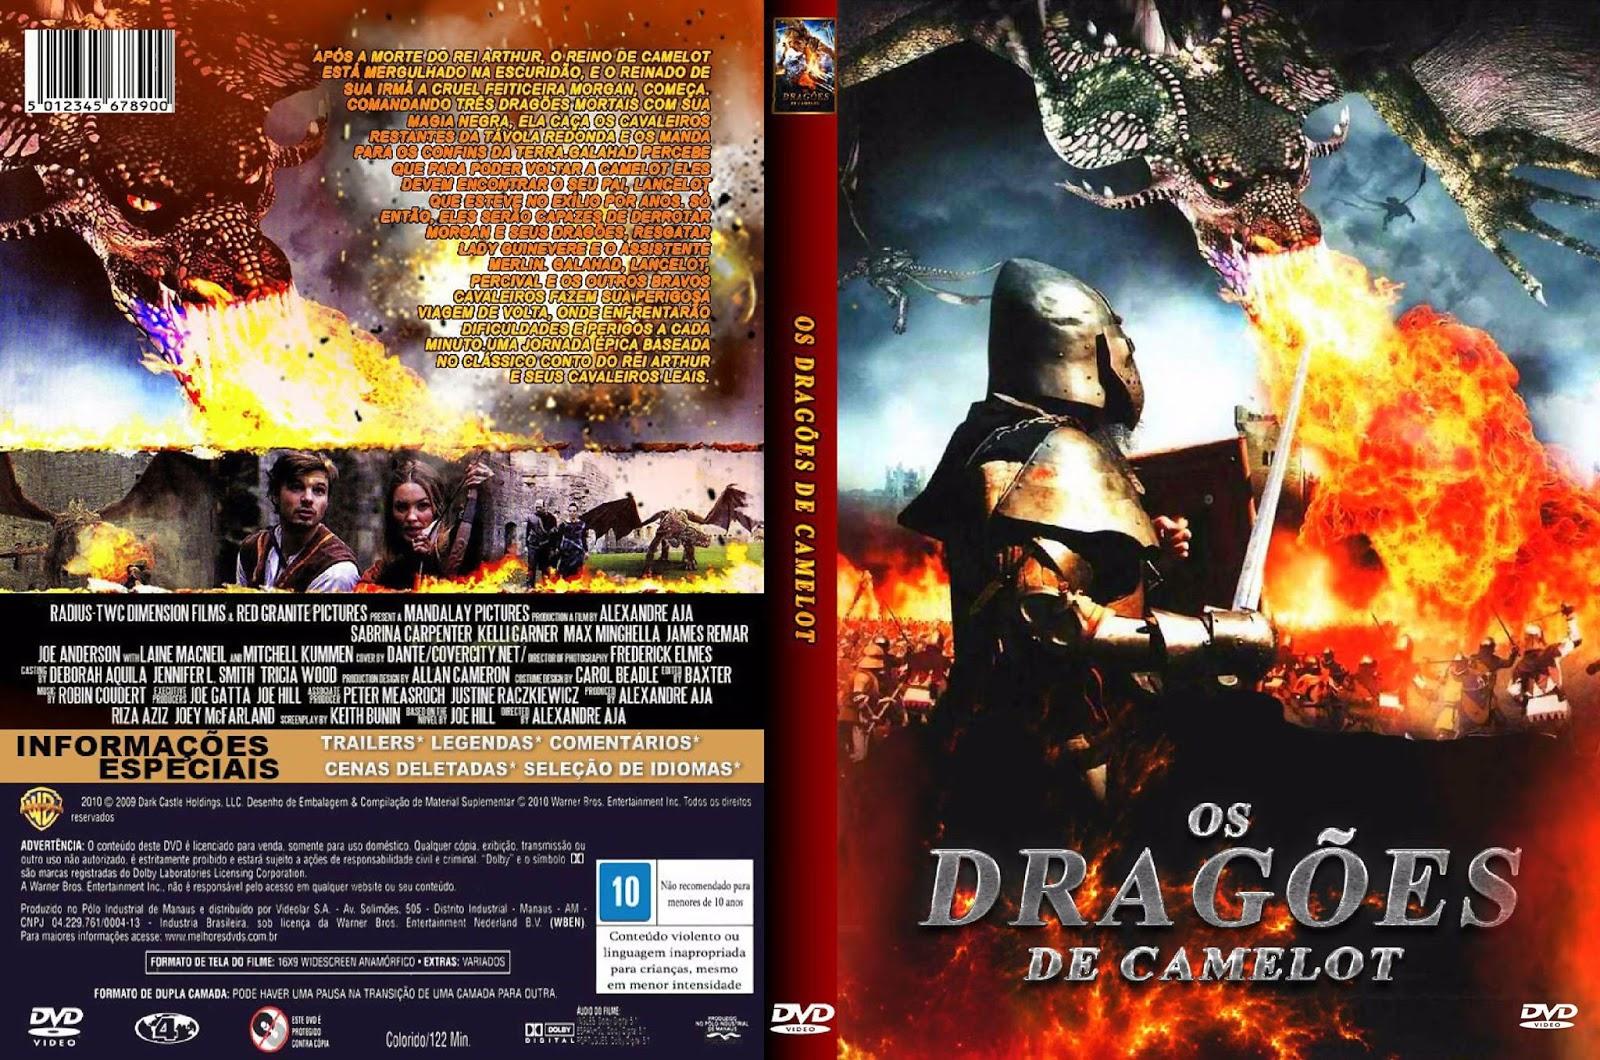 Os Dragões de Camelot DVD-R Os 2BDrag 25C3 25B5es 2BDe 2BCamelot